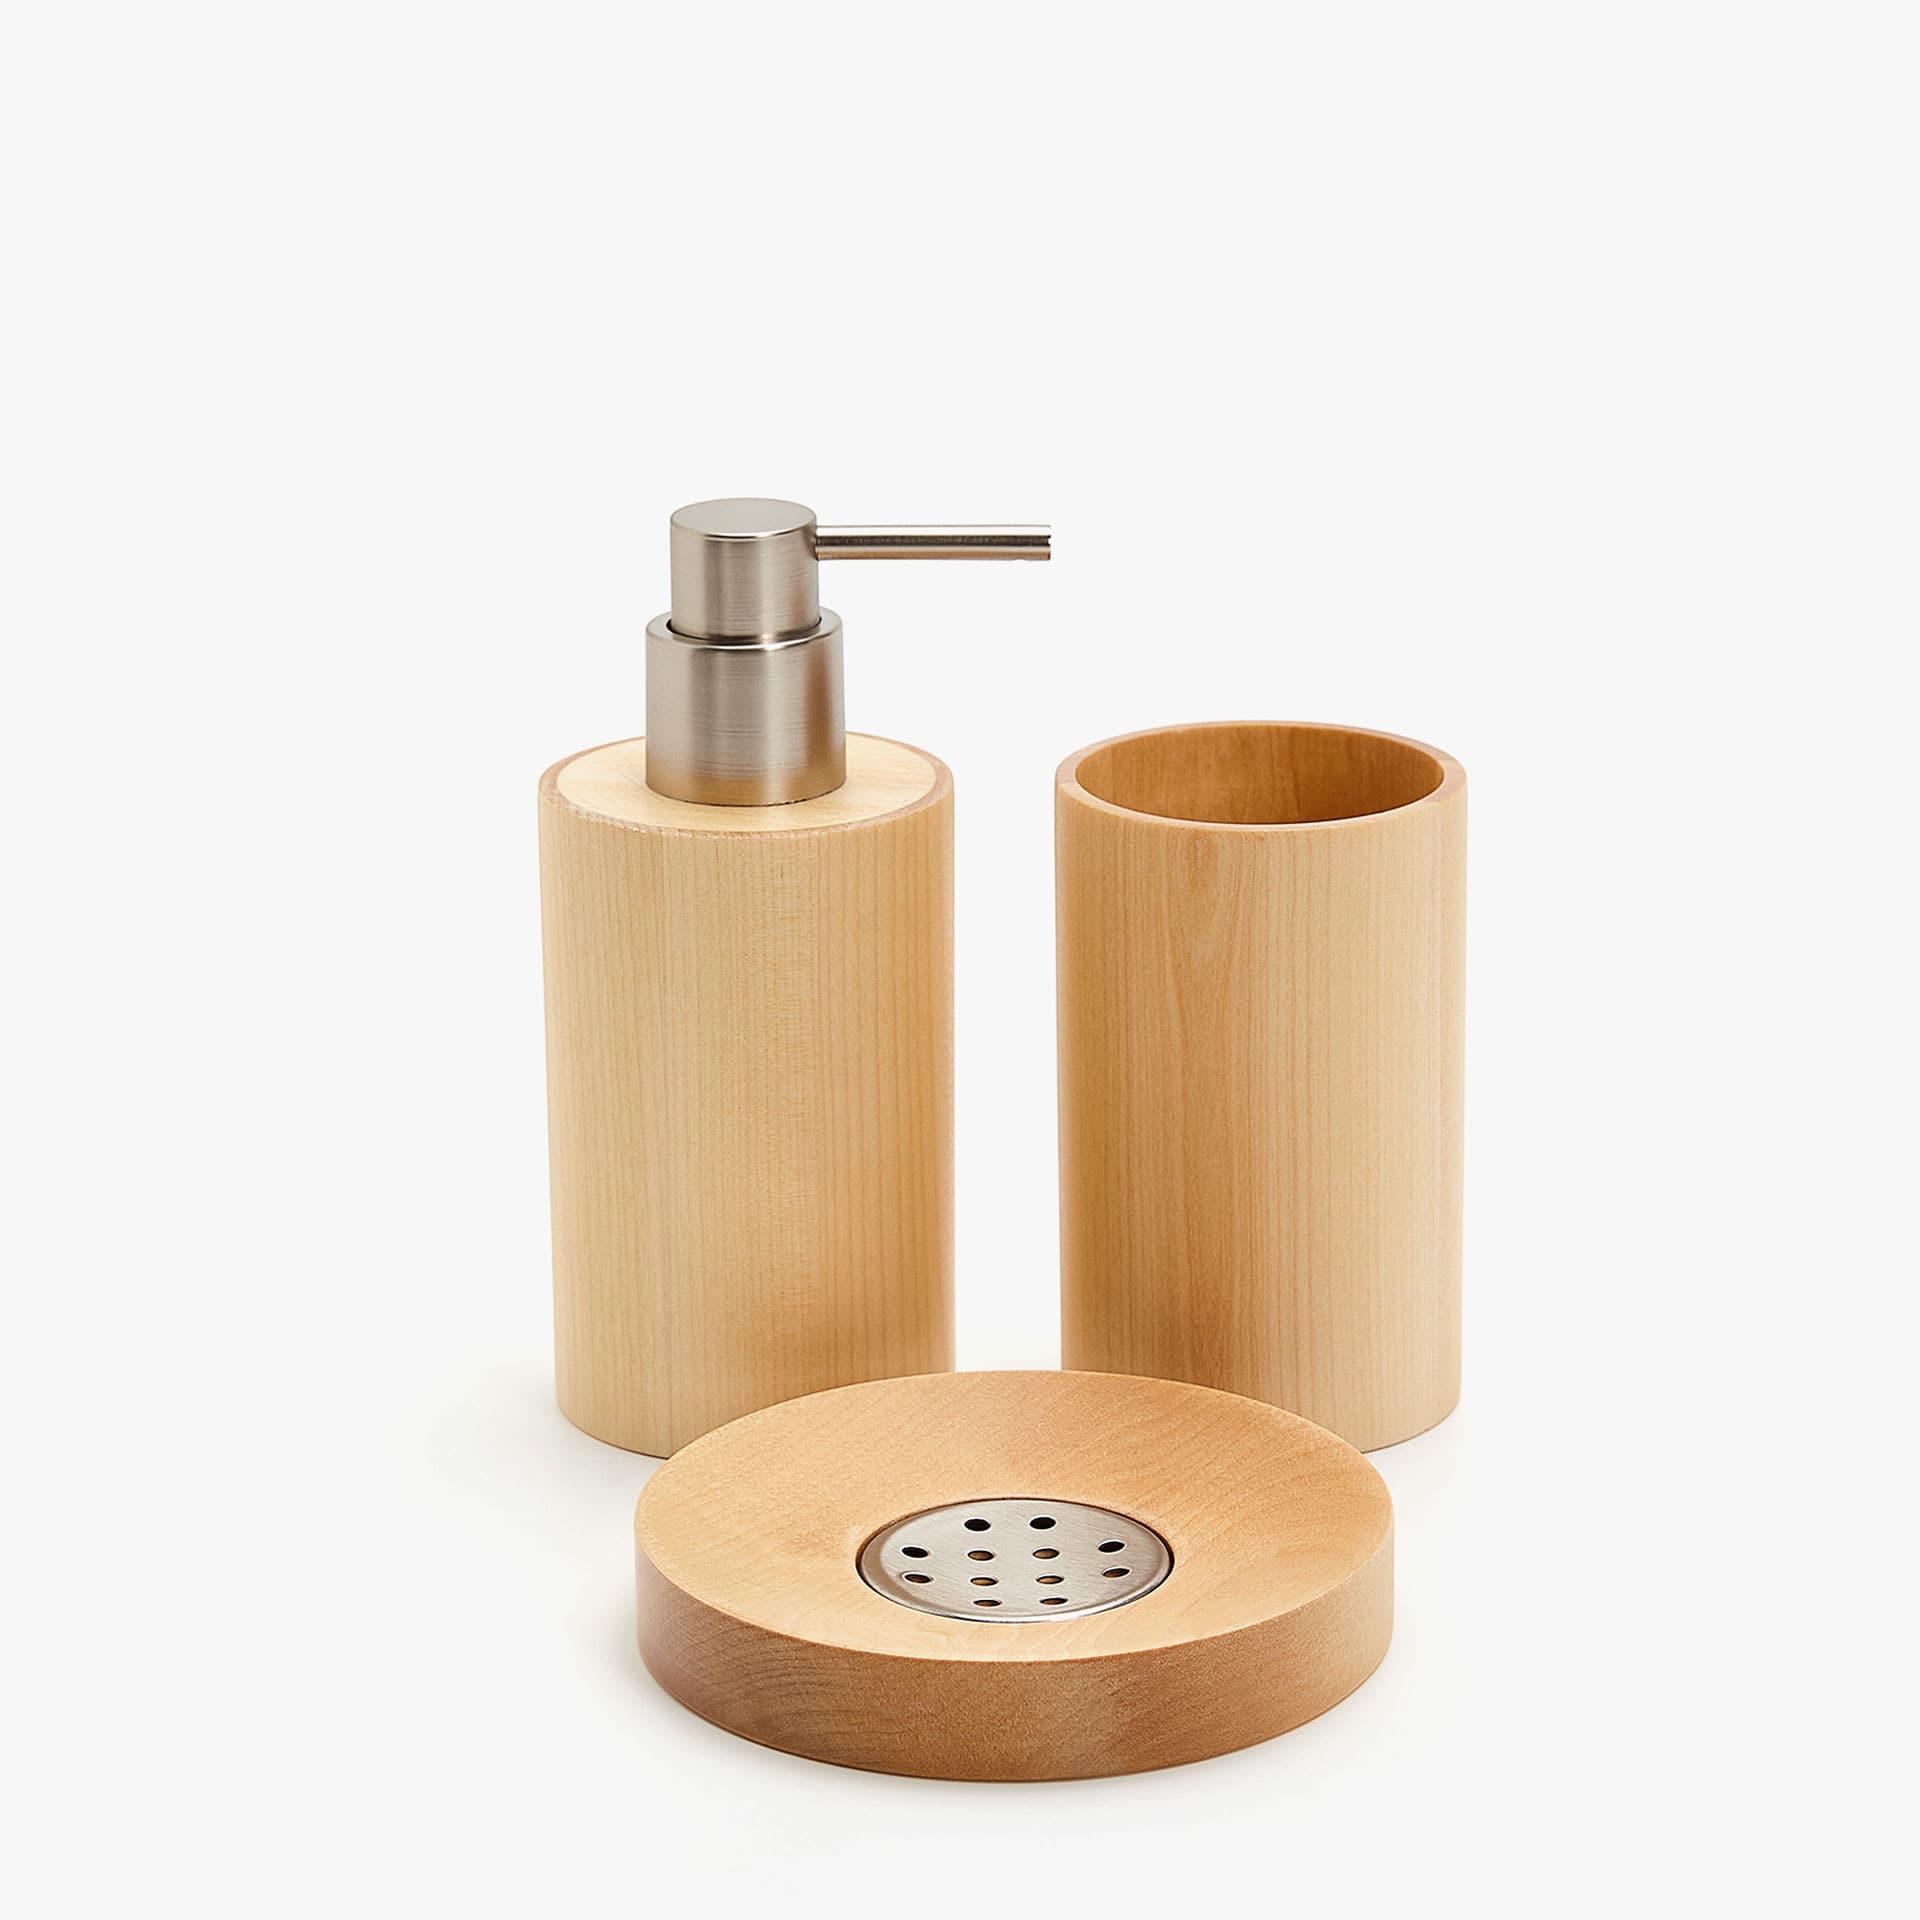 Zara home accesorios ba o idea de la imagen de inicio for Zara home accesorios bano